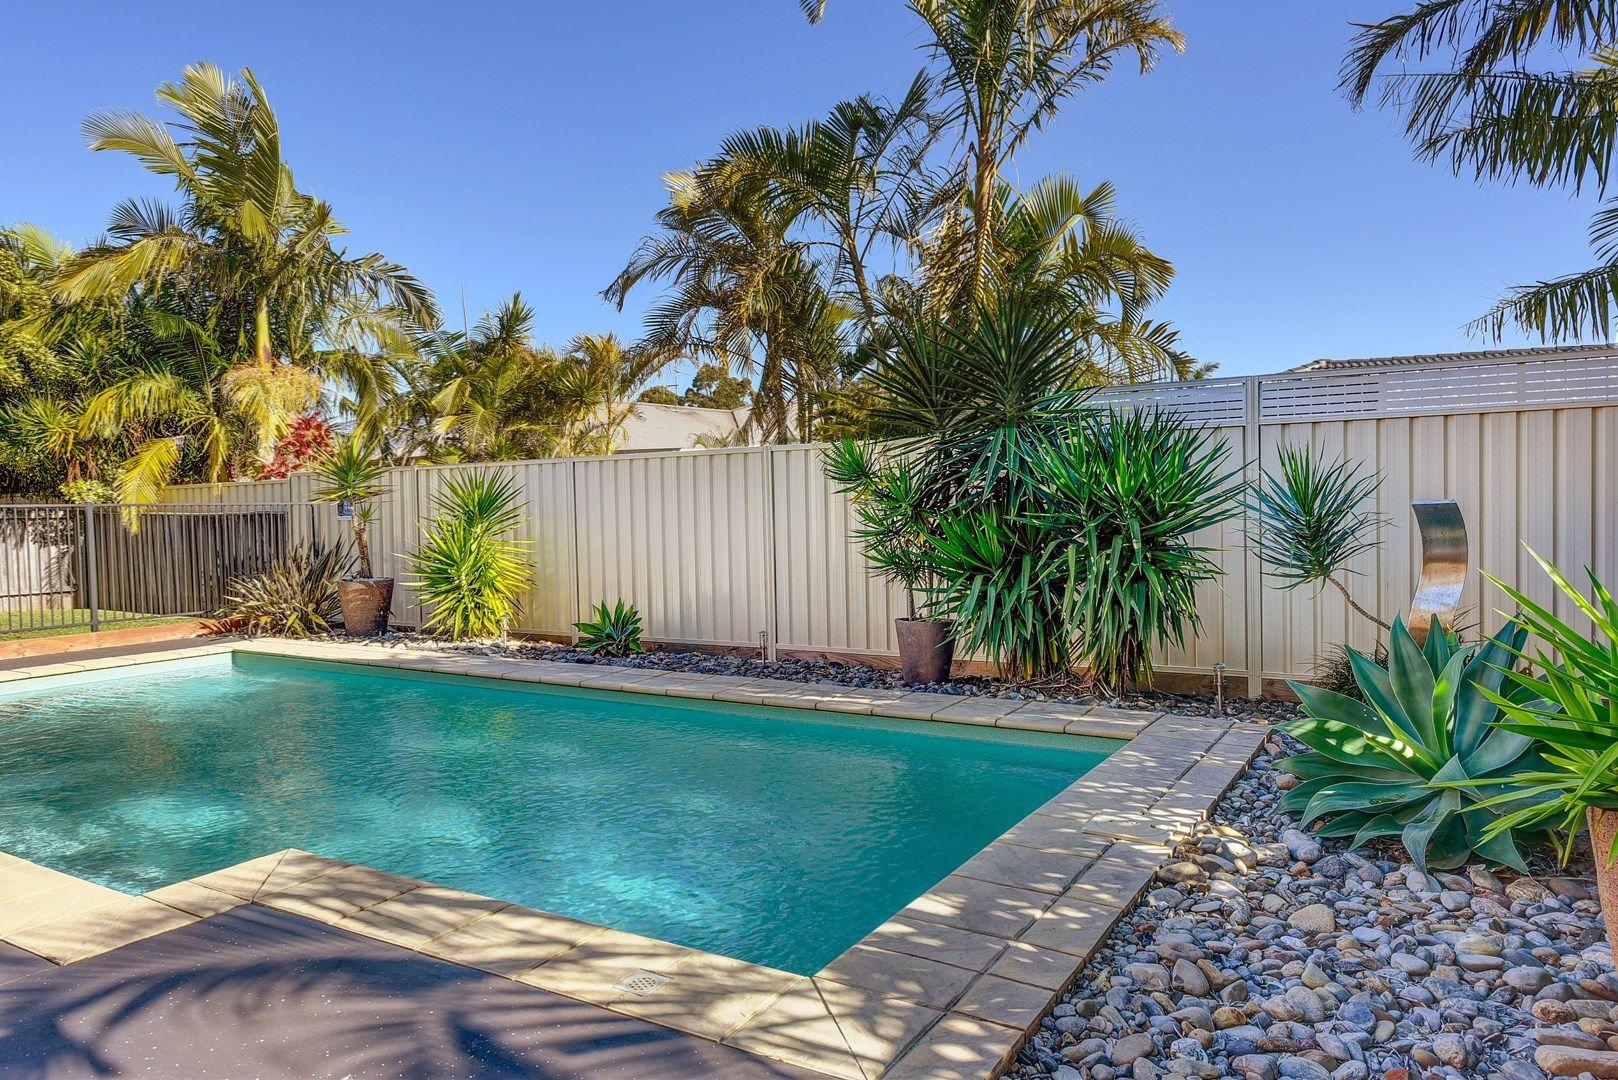 19 Jonas Absalom Drive, Port Macquarie NSW 2444, Image 0